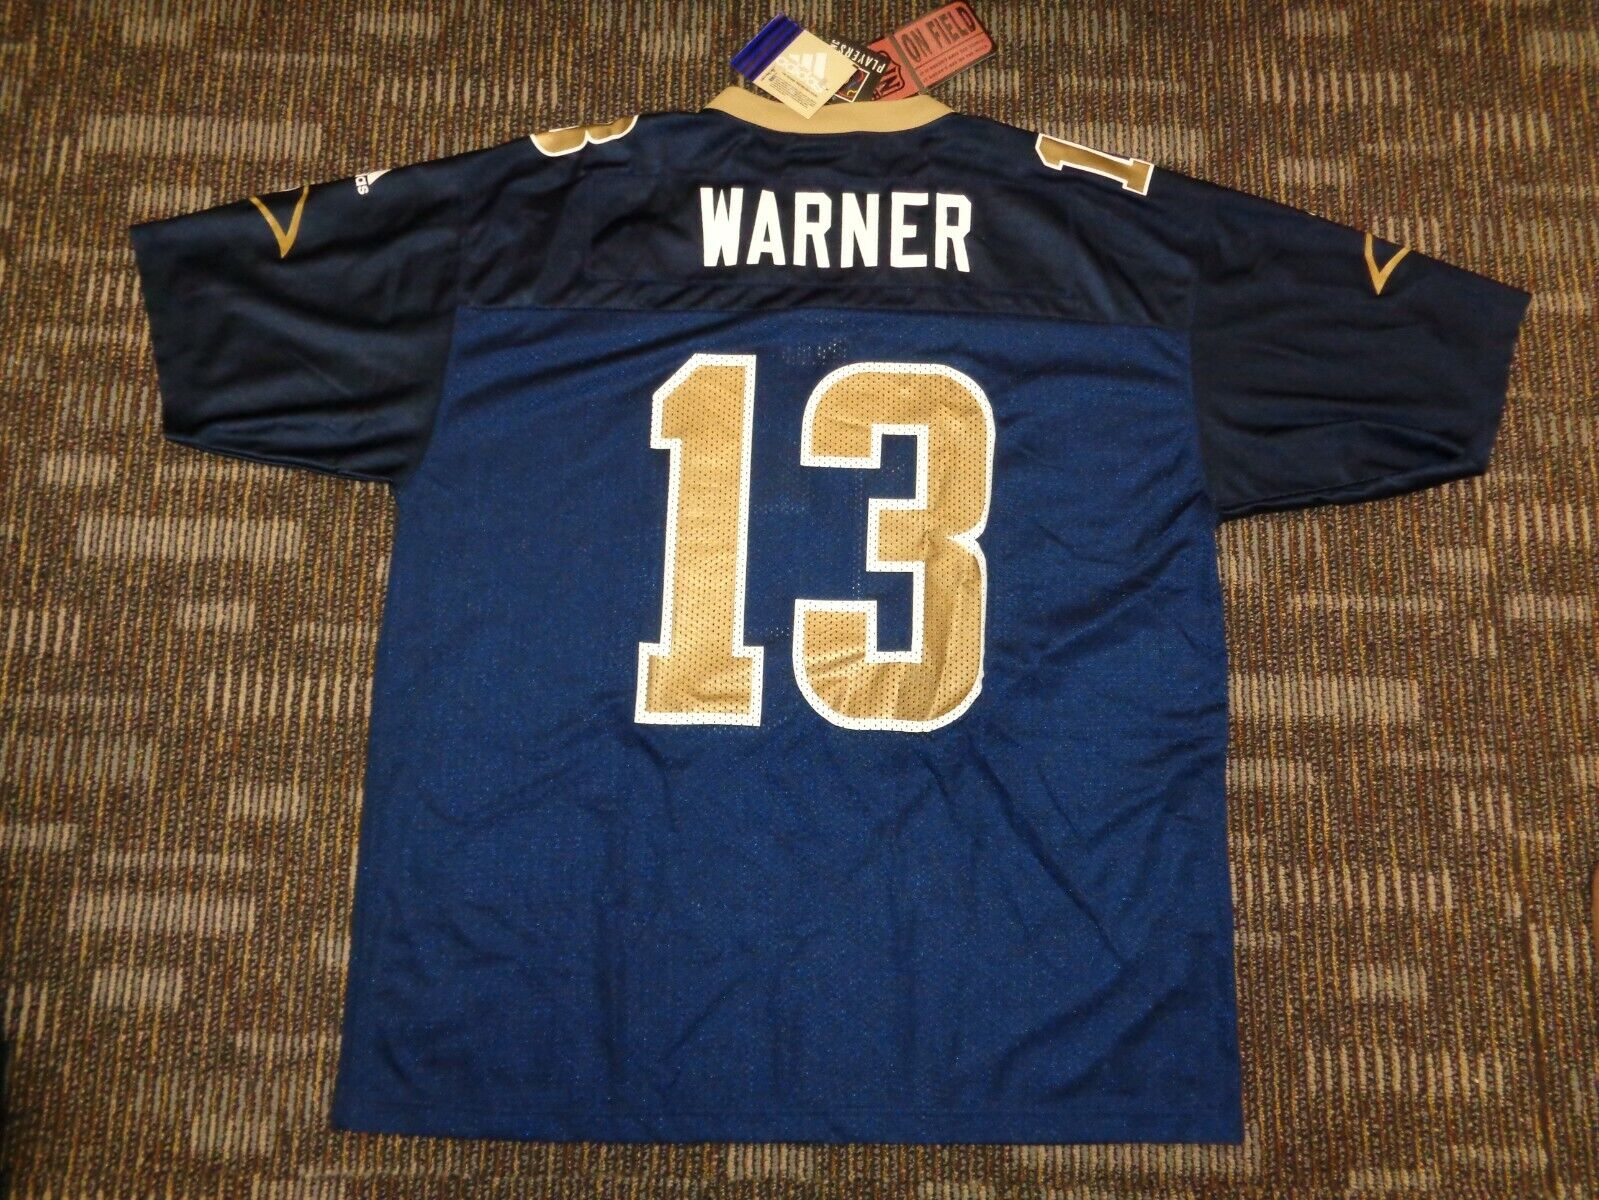 NWT KURT WARNER 13 LOS ANGELES ST.LOUIS RAMS ADIDAS NFL GAME FOOTBALL JERSEY XL - $49.99